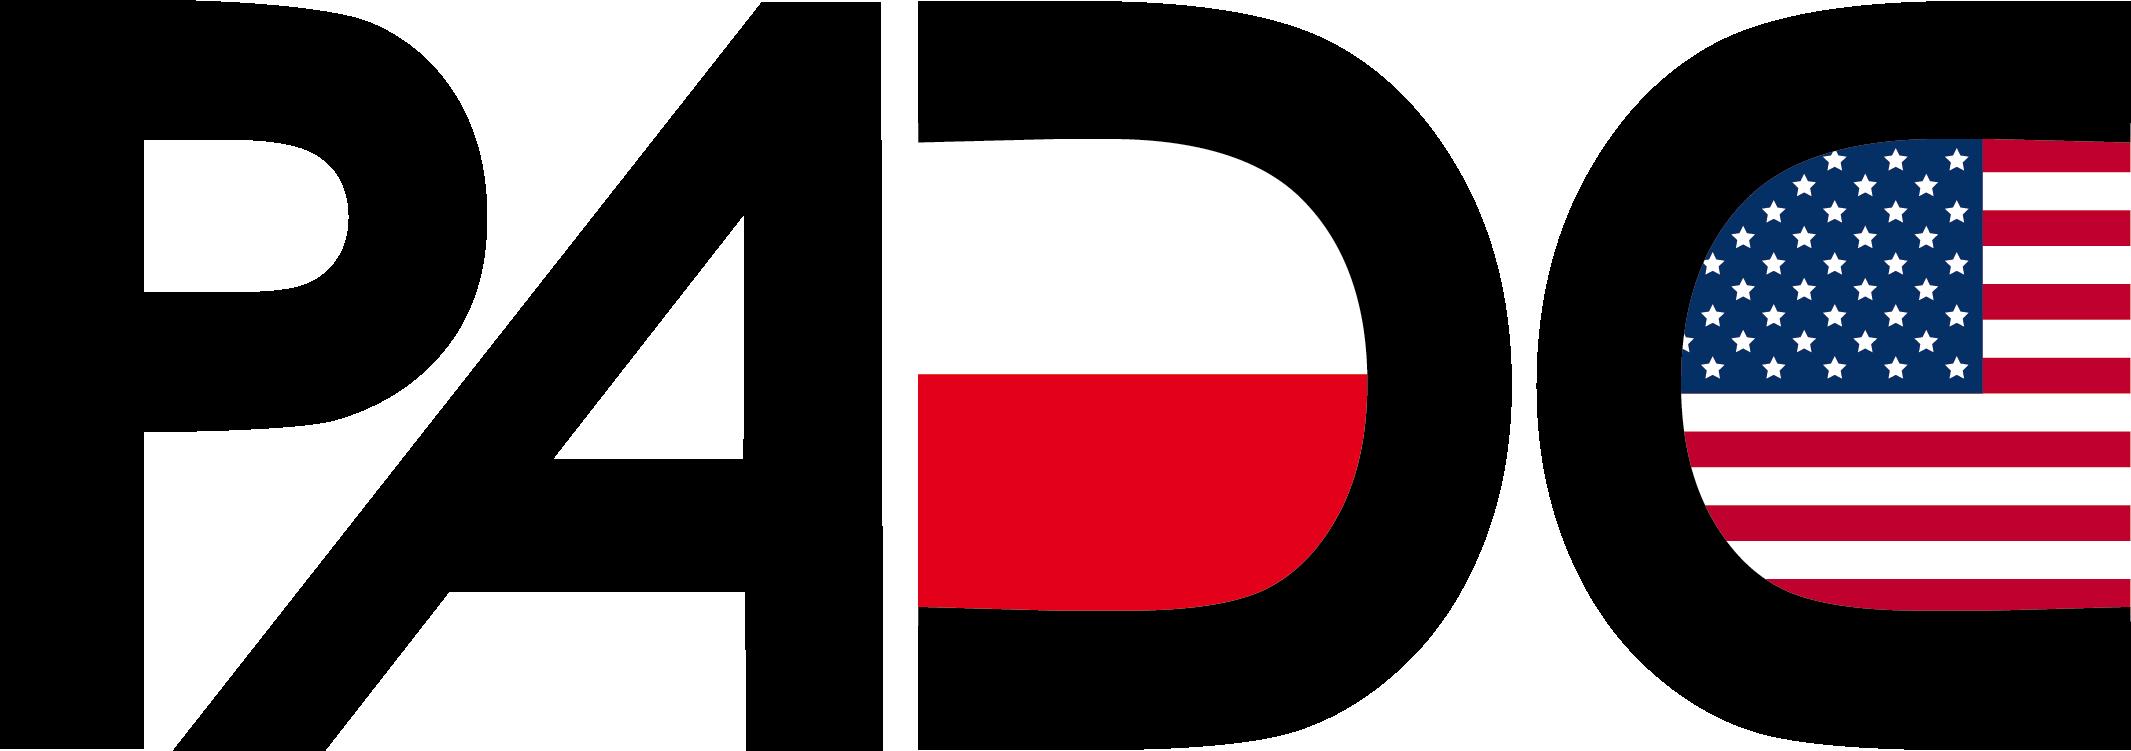 PADC Polish-American Development Council